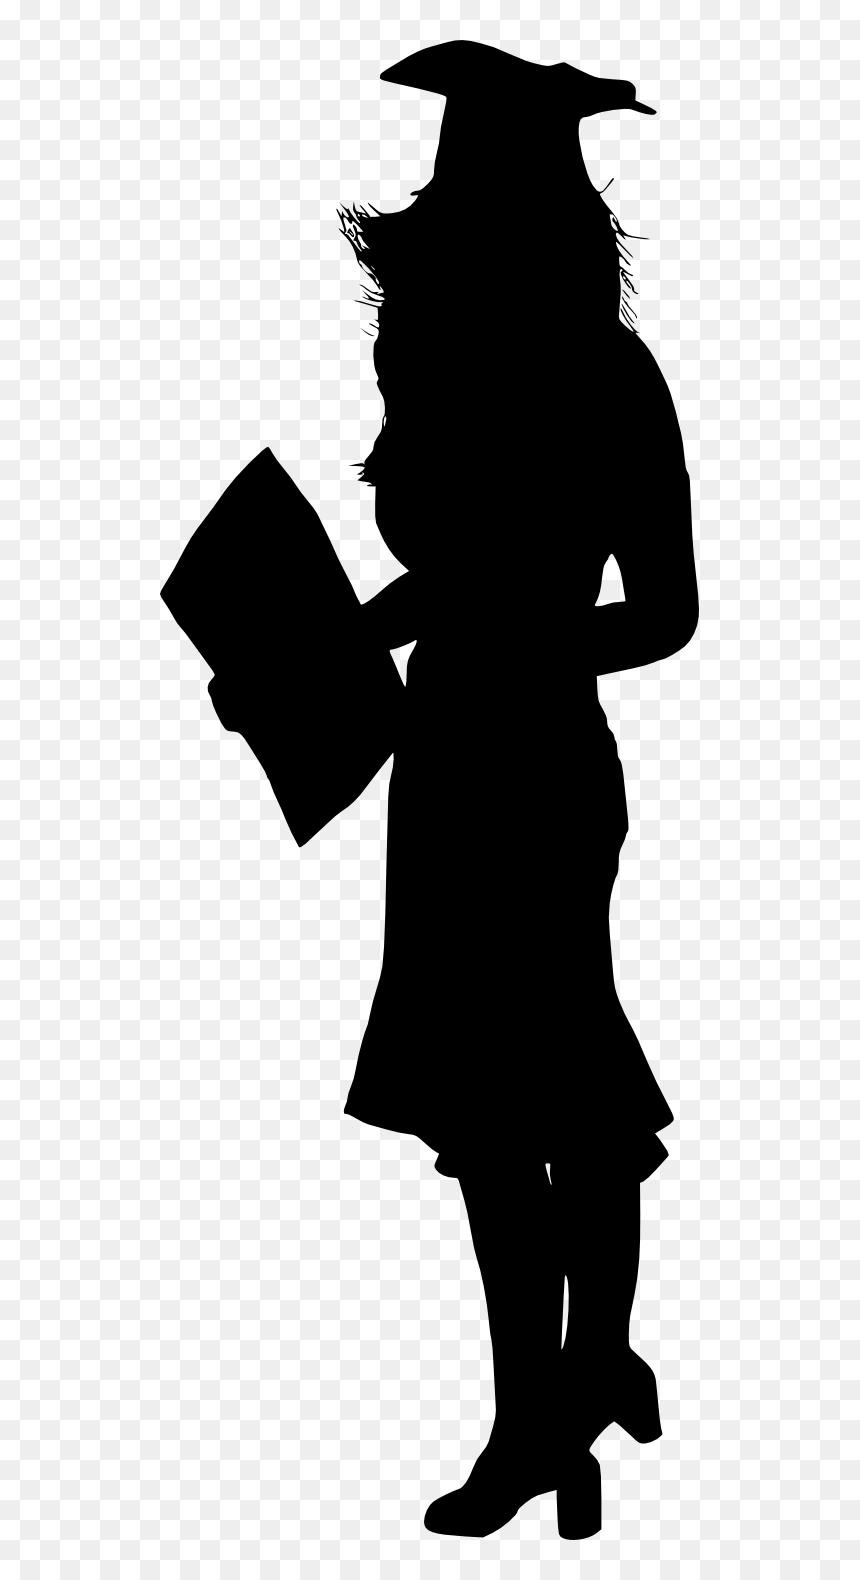 Graduation Silhouette Girl : graduation, silhouette, Graduation, Silhouette, Transparent